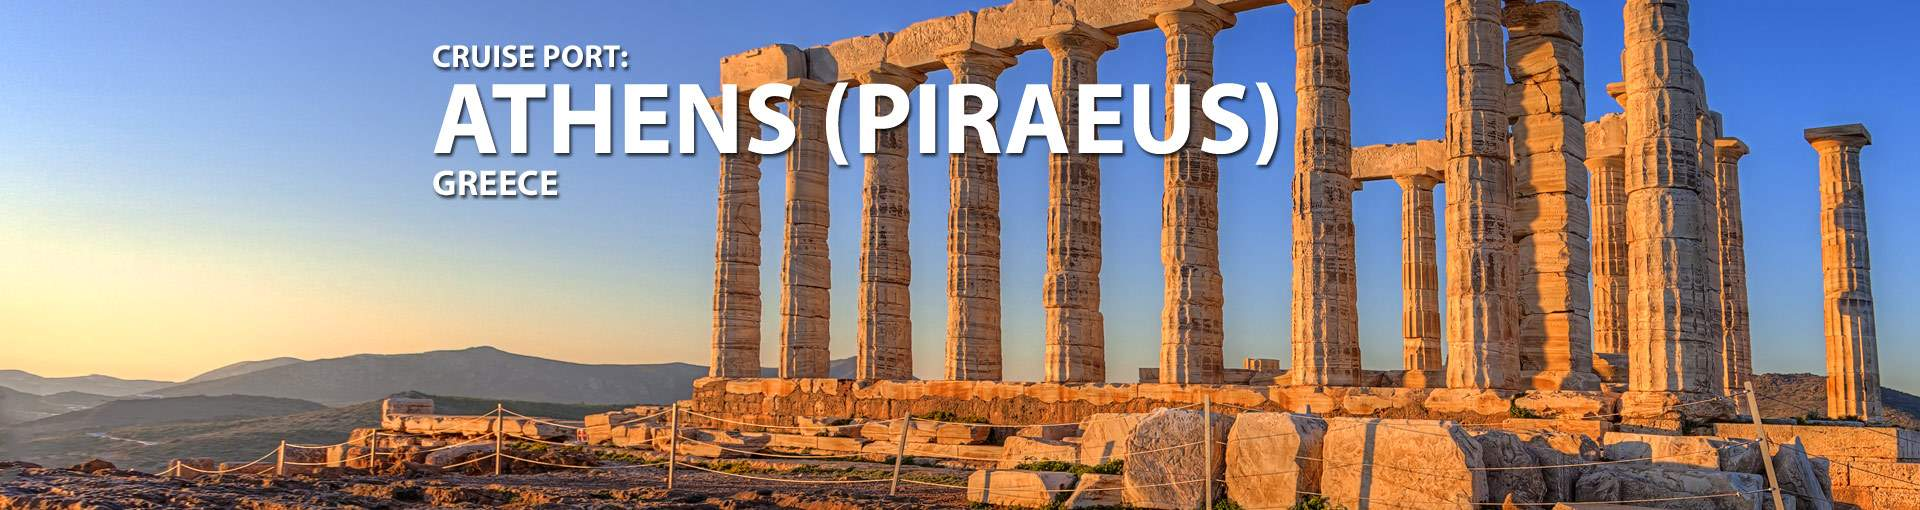 Cruises from Piraeus, Athens, Greece